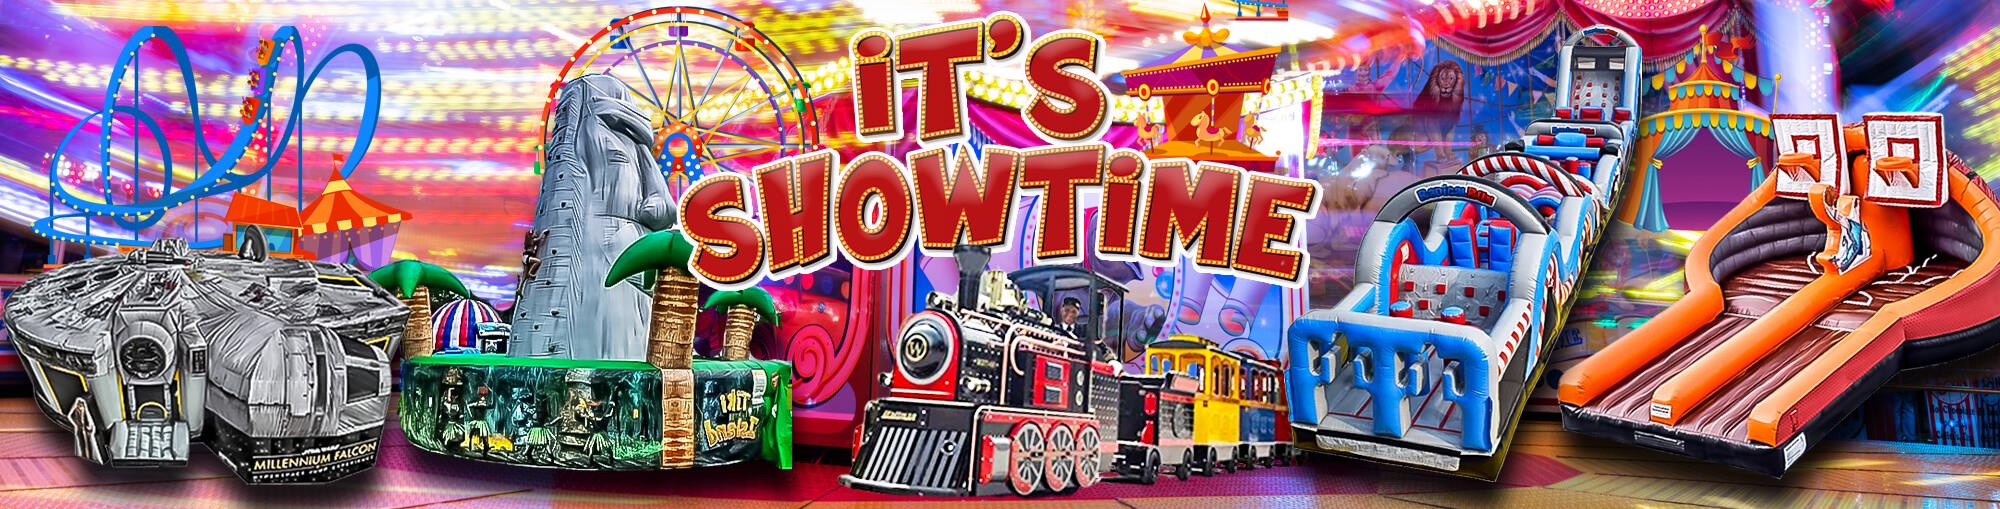 showtime events houston